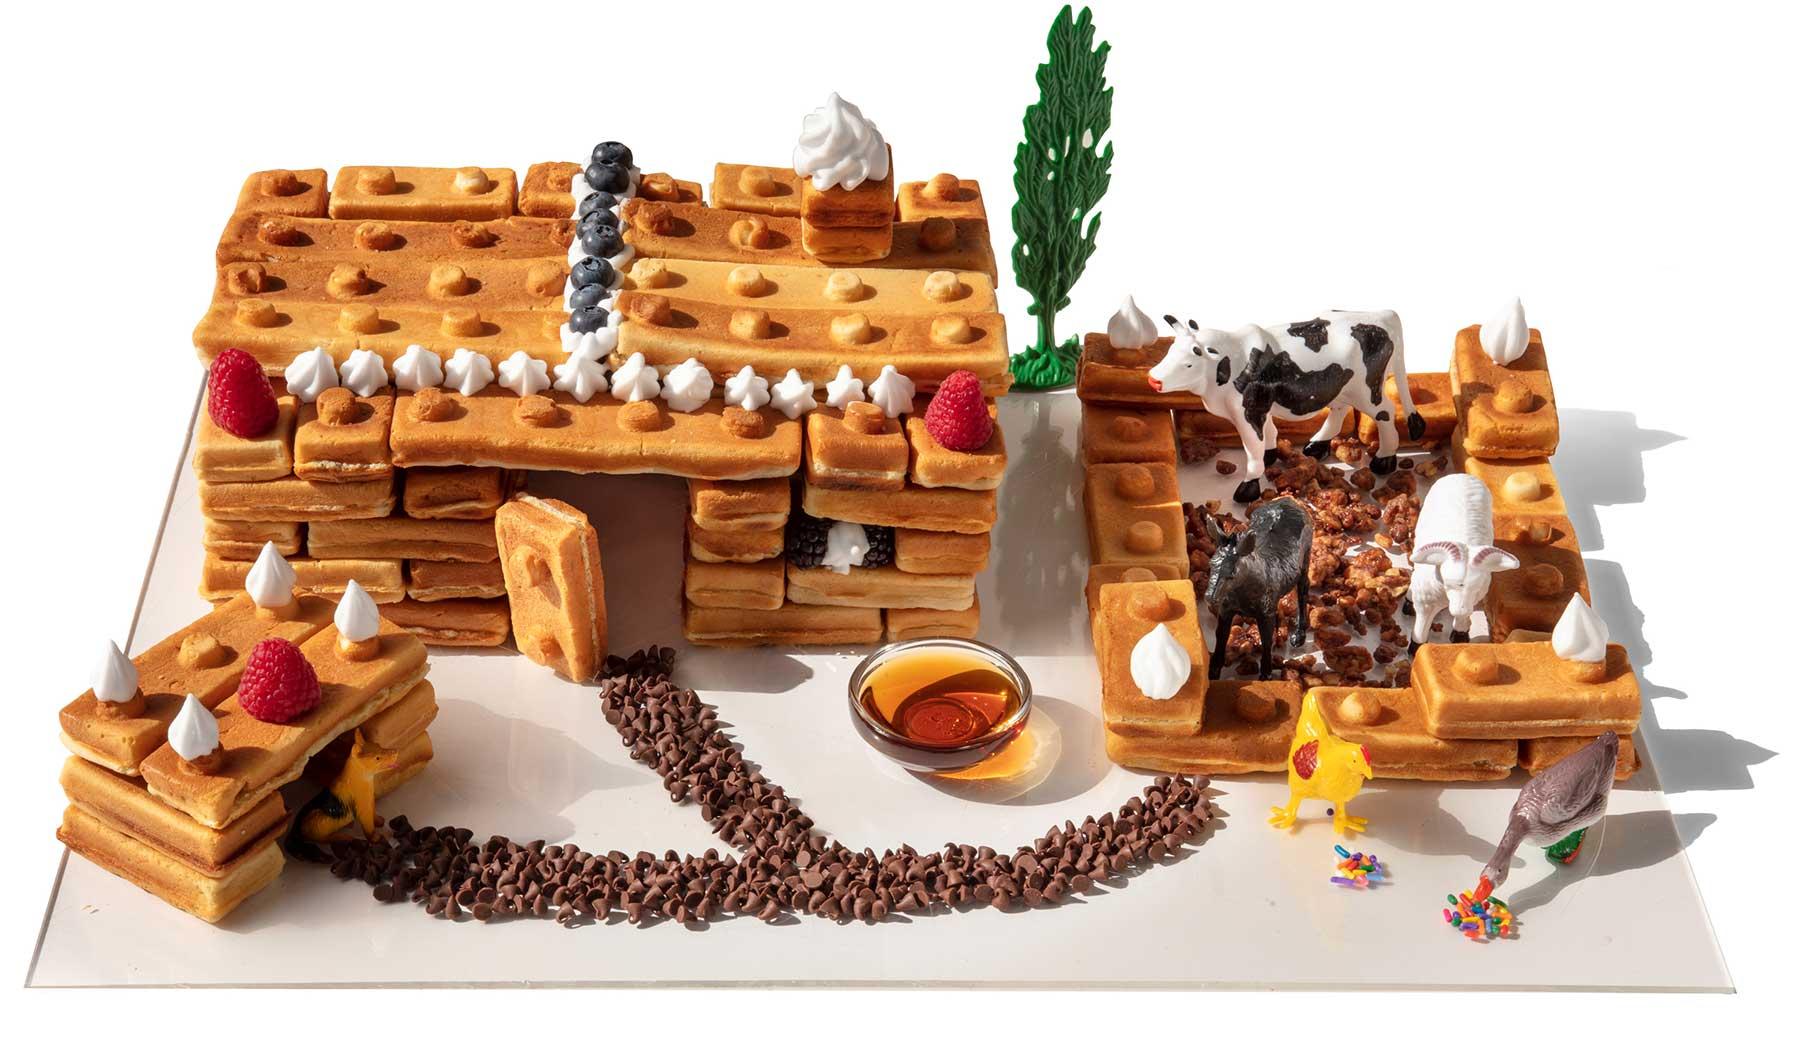 LEGO-Stein-Waffeleisen LEGO-Stein-Waffeleisen_02